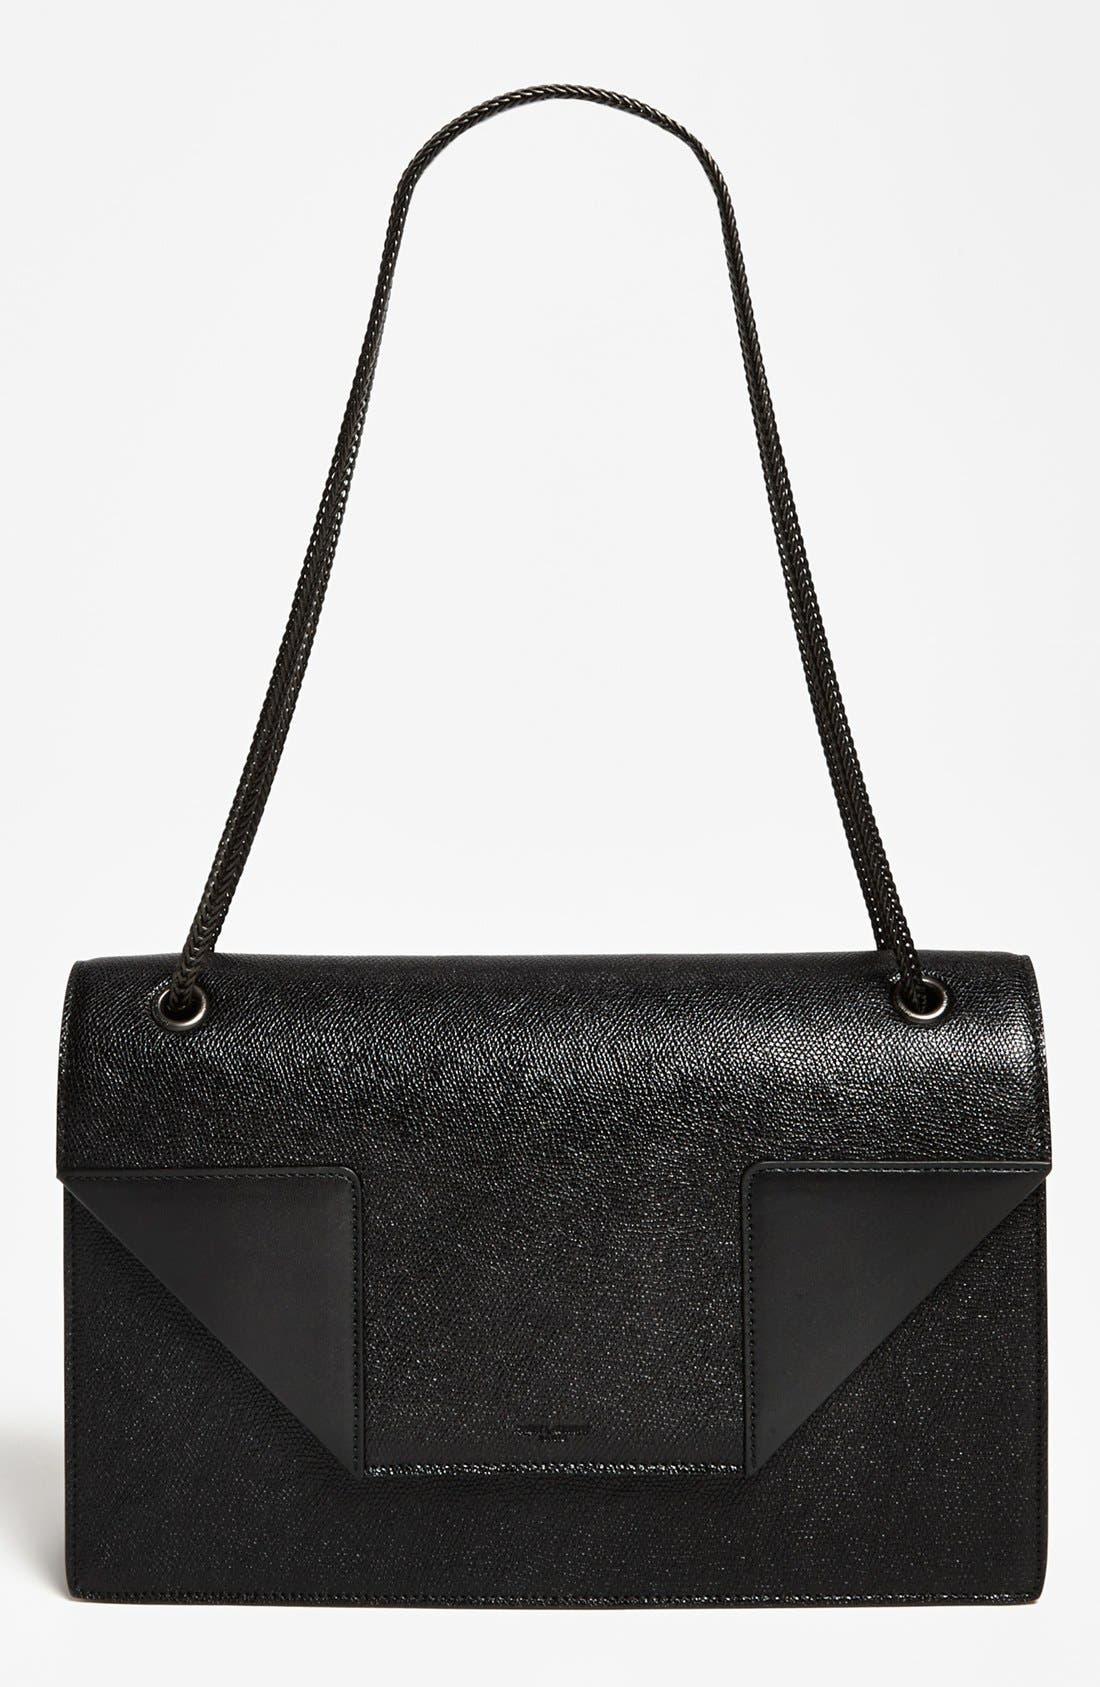 Main Image - Saint Laurent 'Betty - Medium' Leather Shoulder Bag